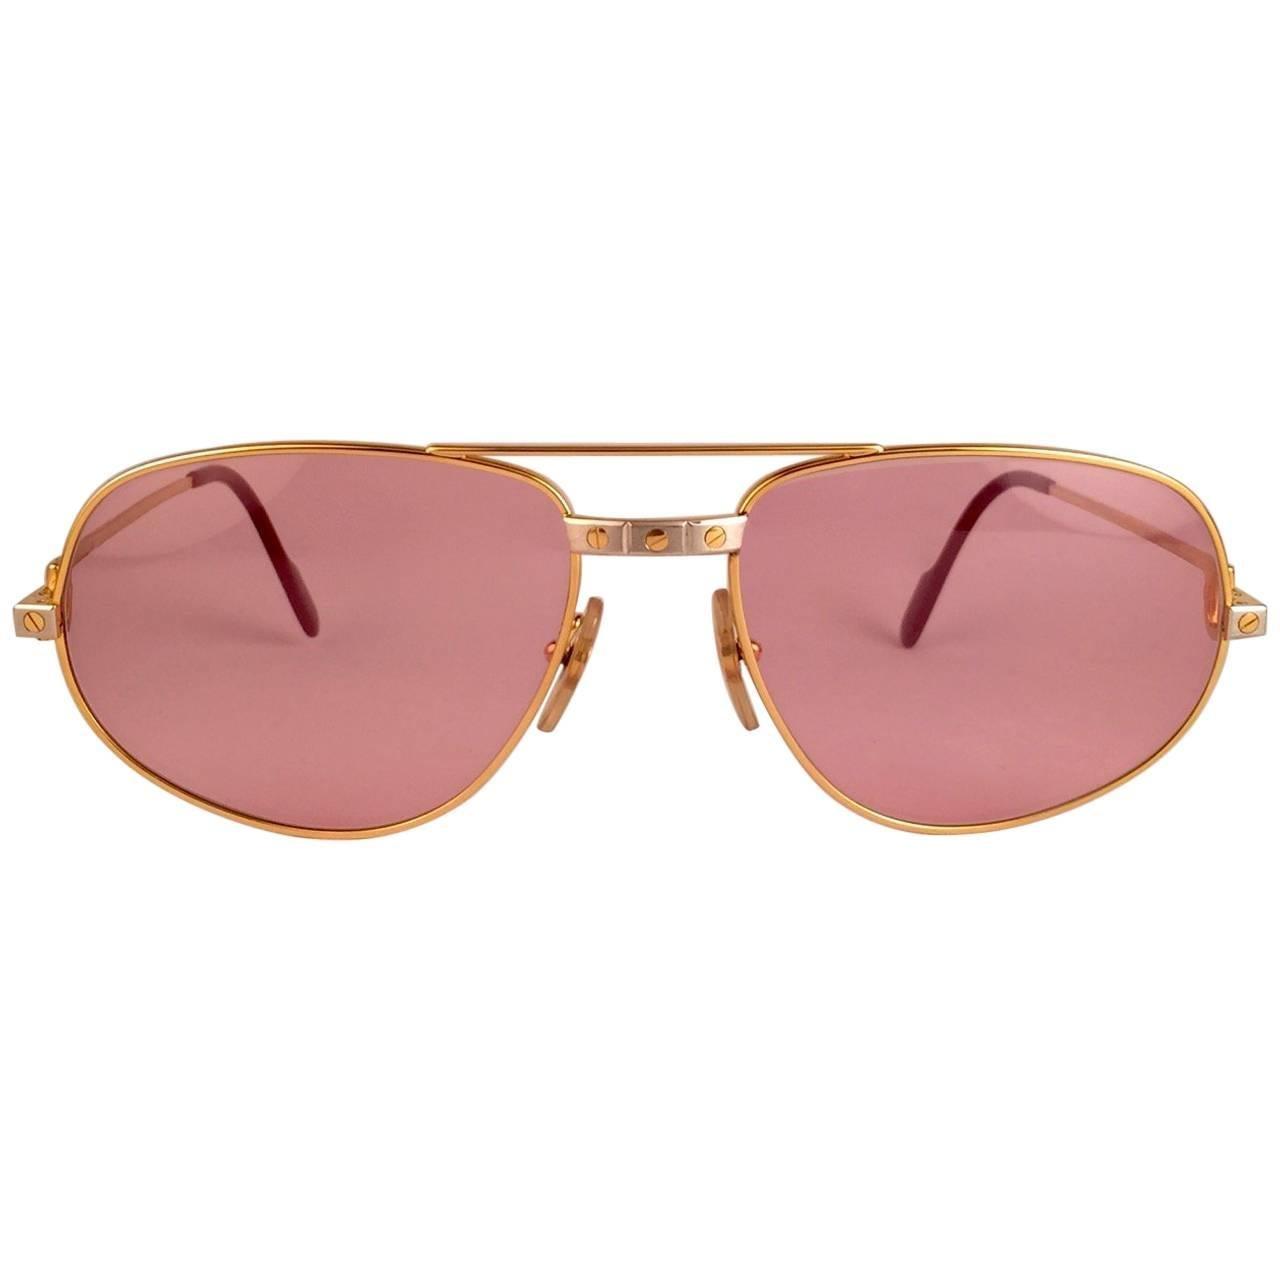 Cartier Santos Romance Rose Pink Lenses 58mm Drake 18k Gold Sunglasses